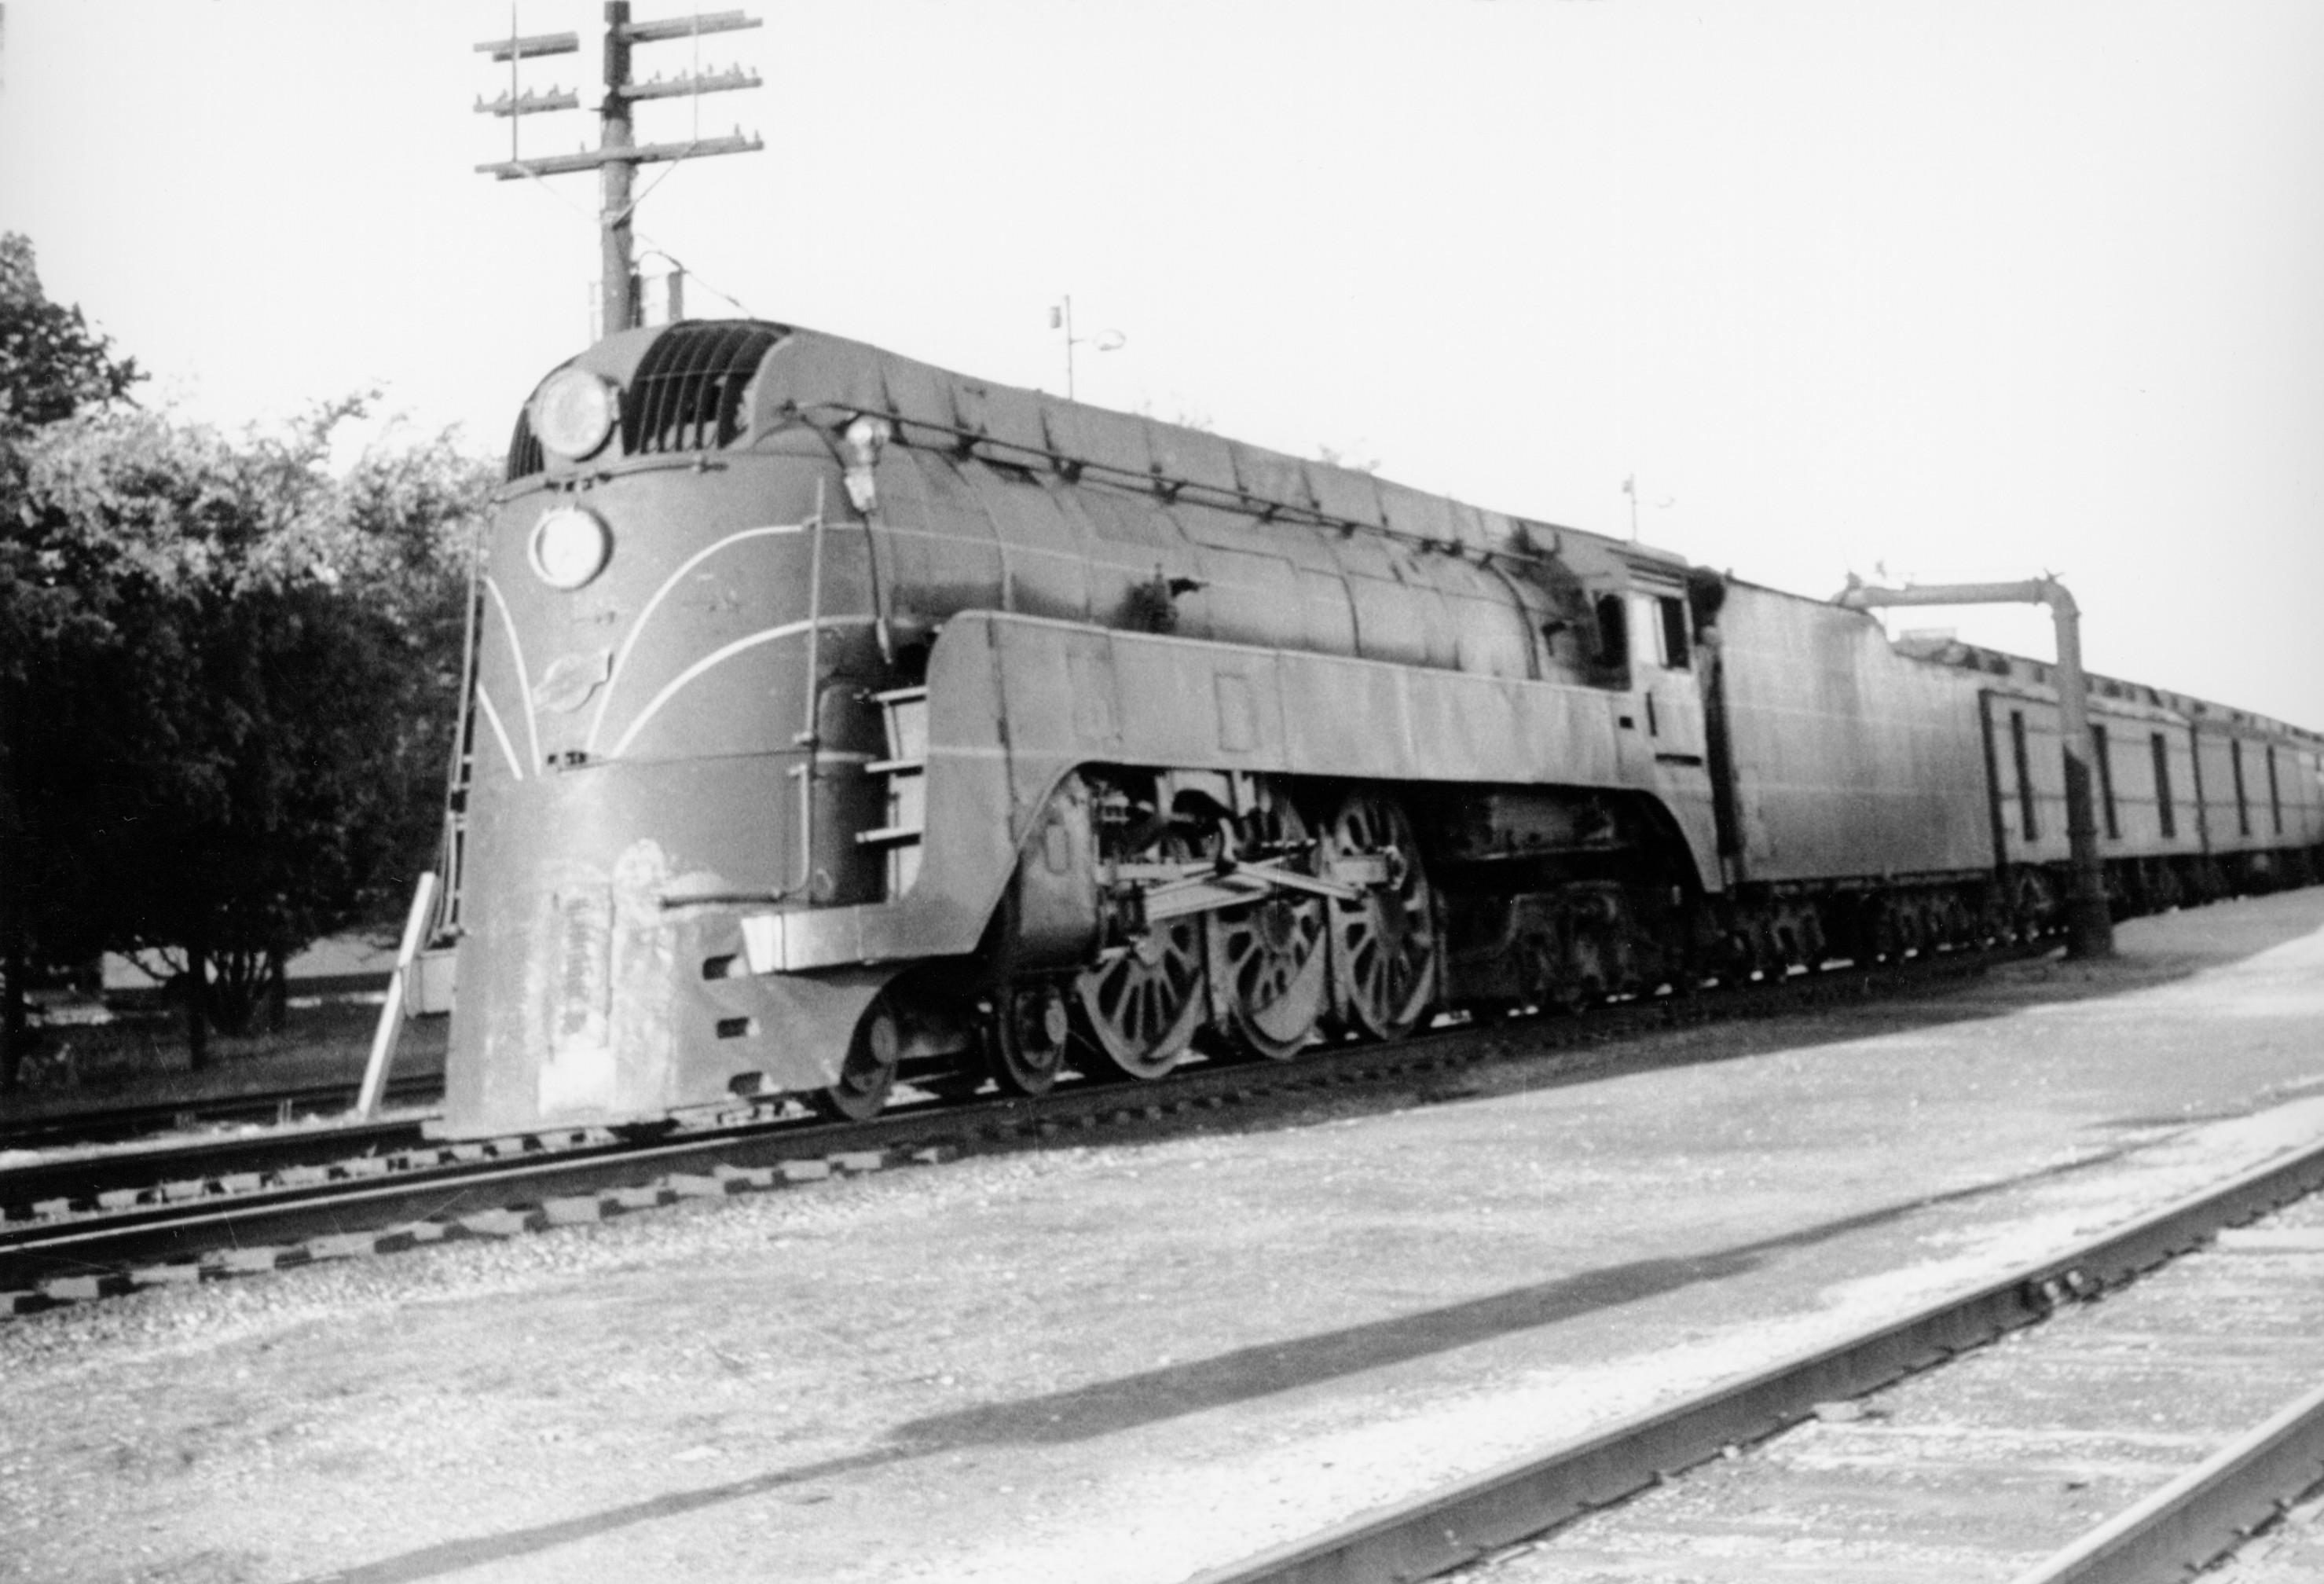 Chicago Amp Northwestern Railroad Ames Historical Society